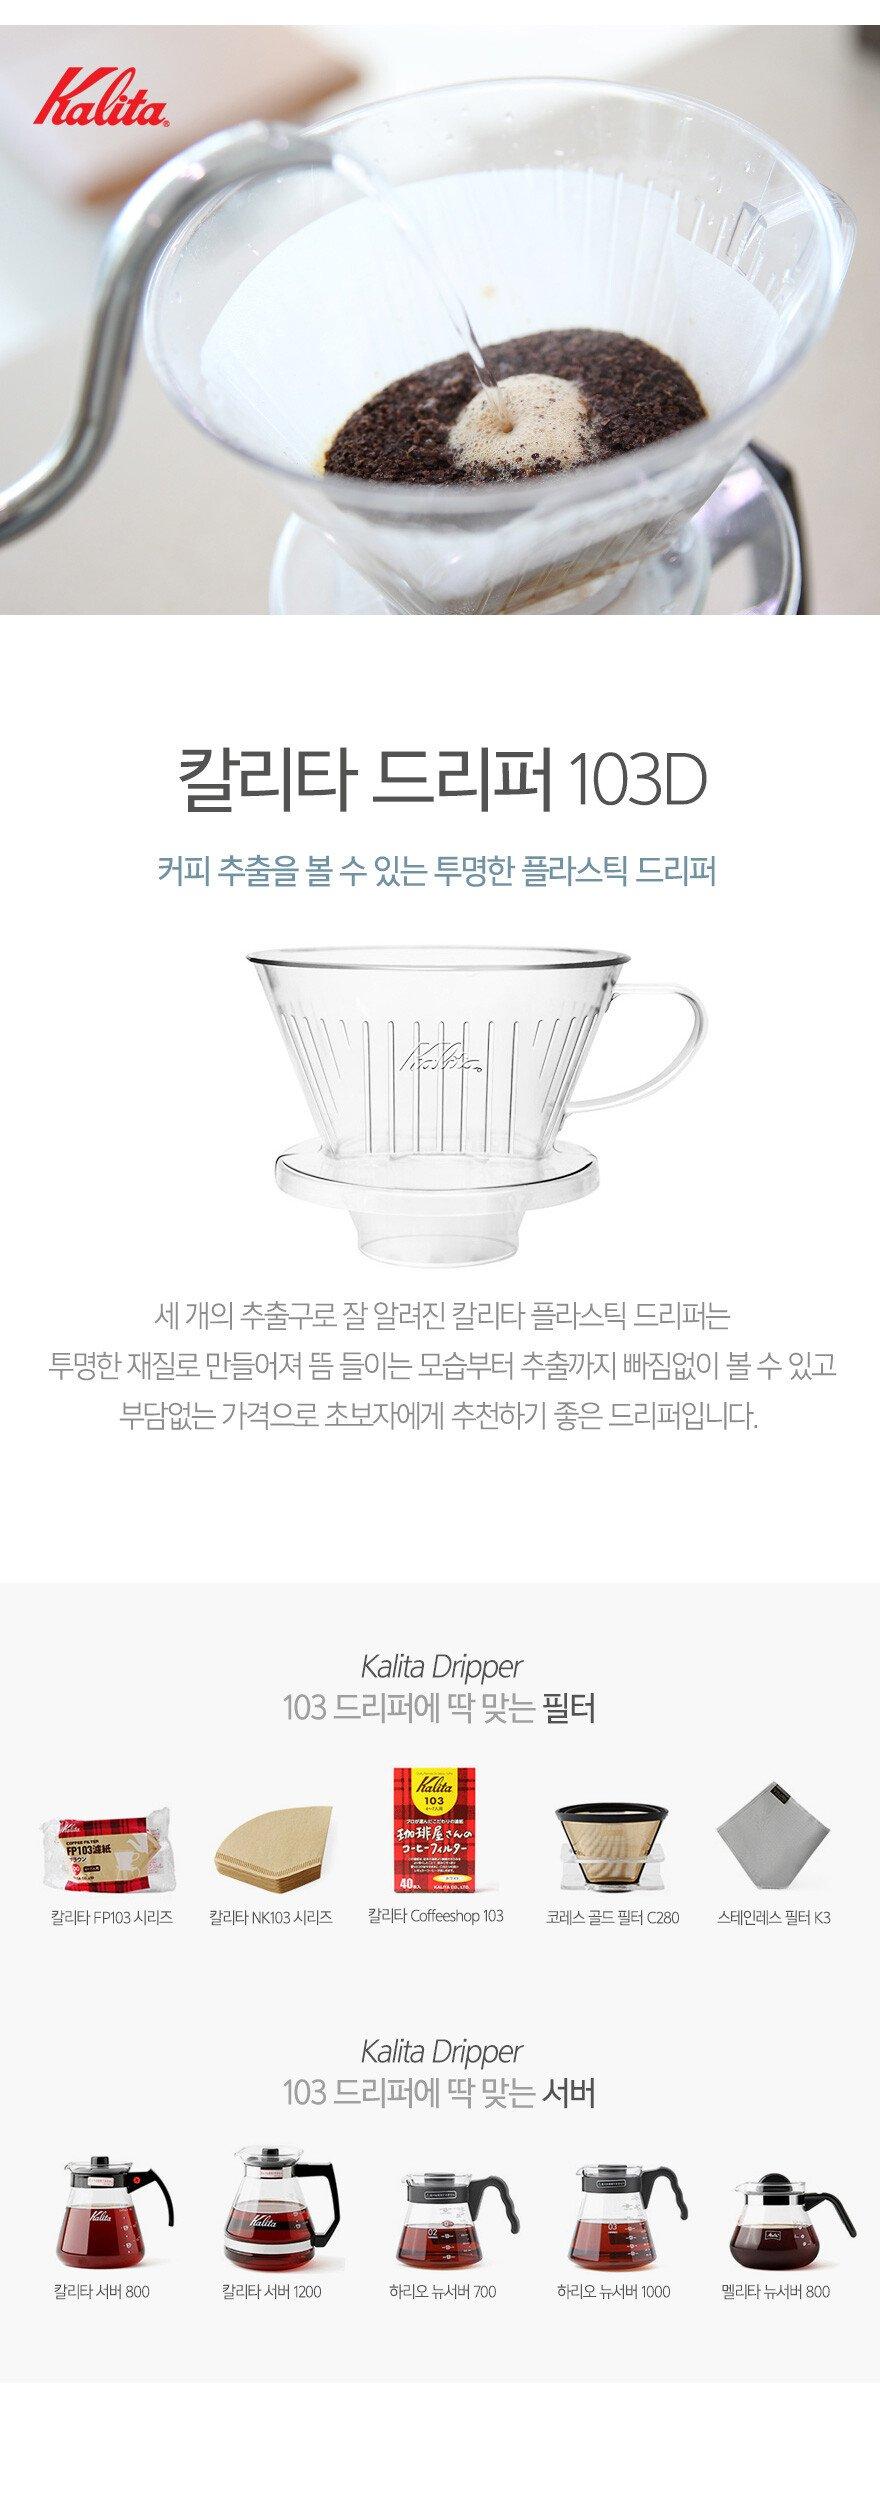 2039_kalita_103D.jpg 집에서 커피 마시는 데 취미붙인 핸드드립 초보가 써보는 커피이야기.jpg